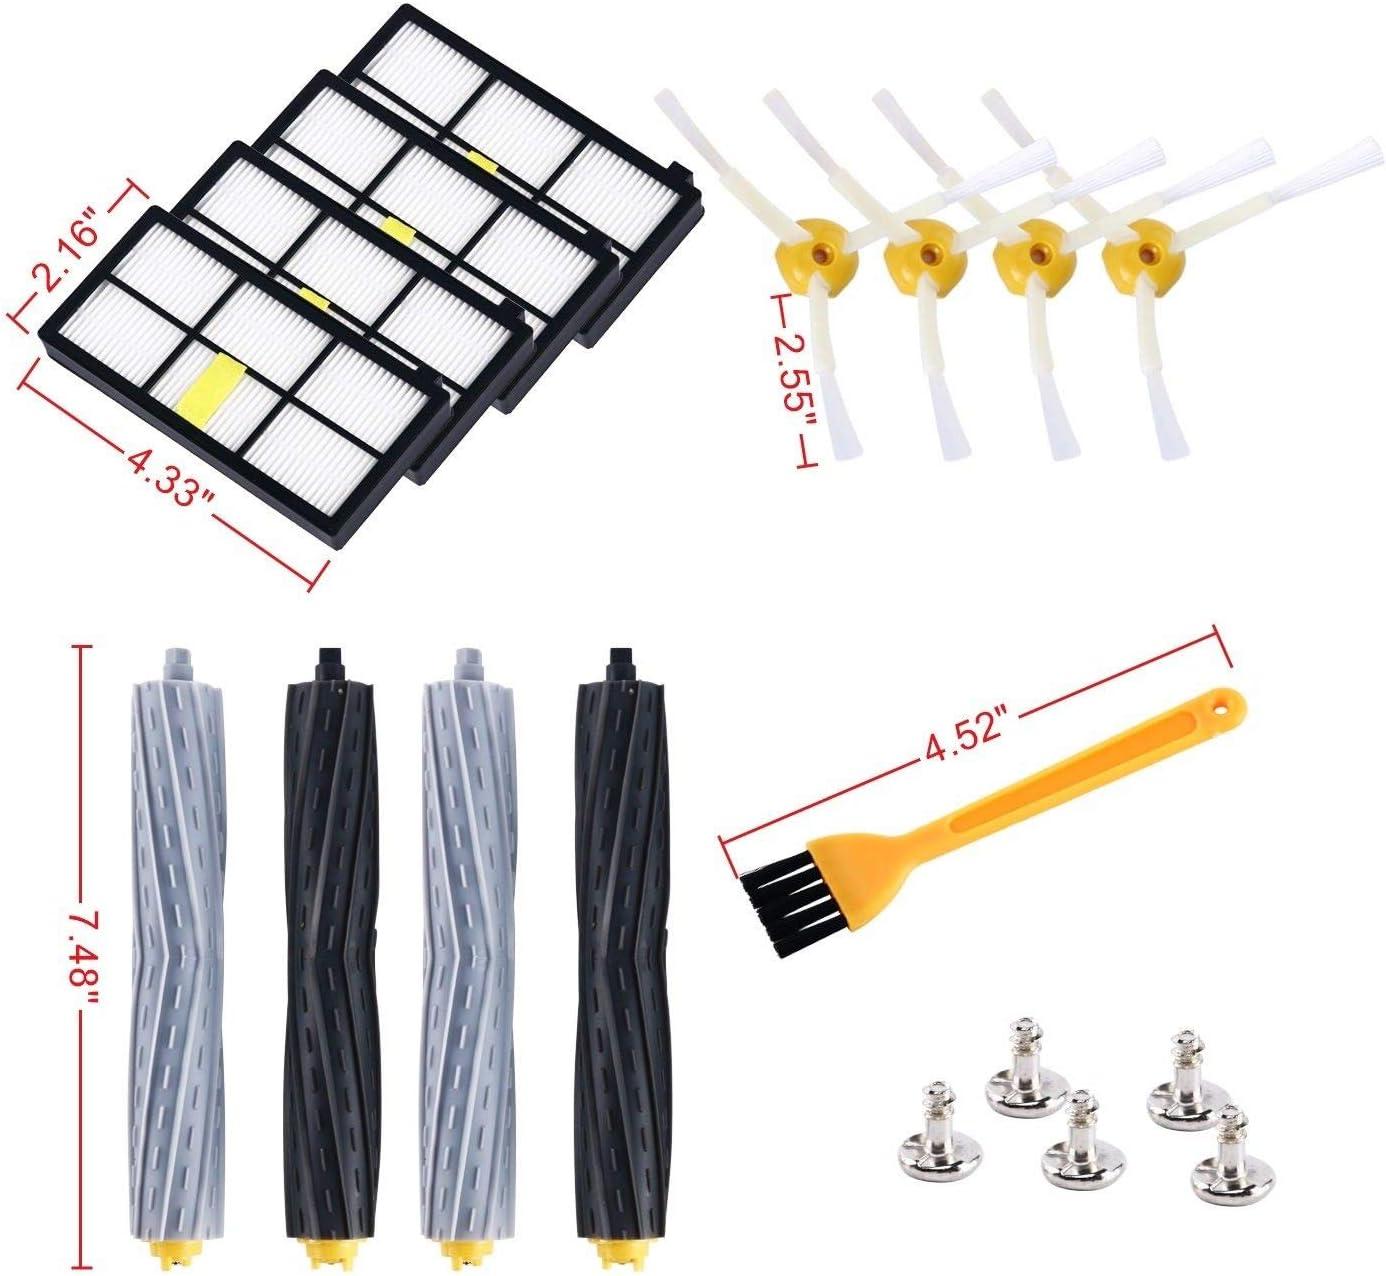 4Wild 14PCs Filters Brush Extractor Replenishment Kit for iRobot Roomba 800,880,900,980 Series,Vacuum Brush Replacement Part